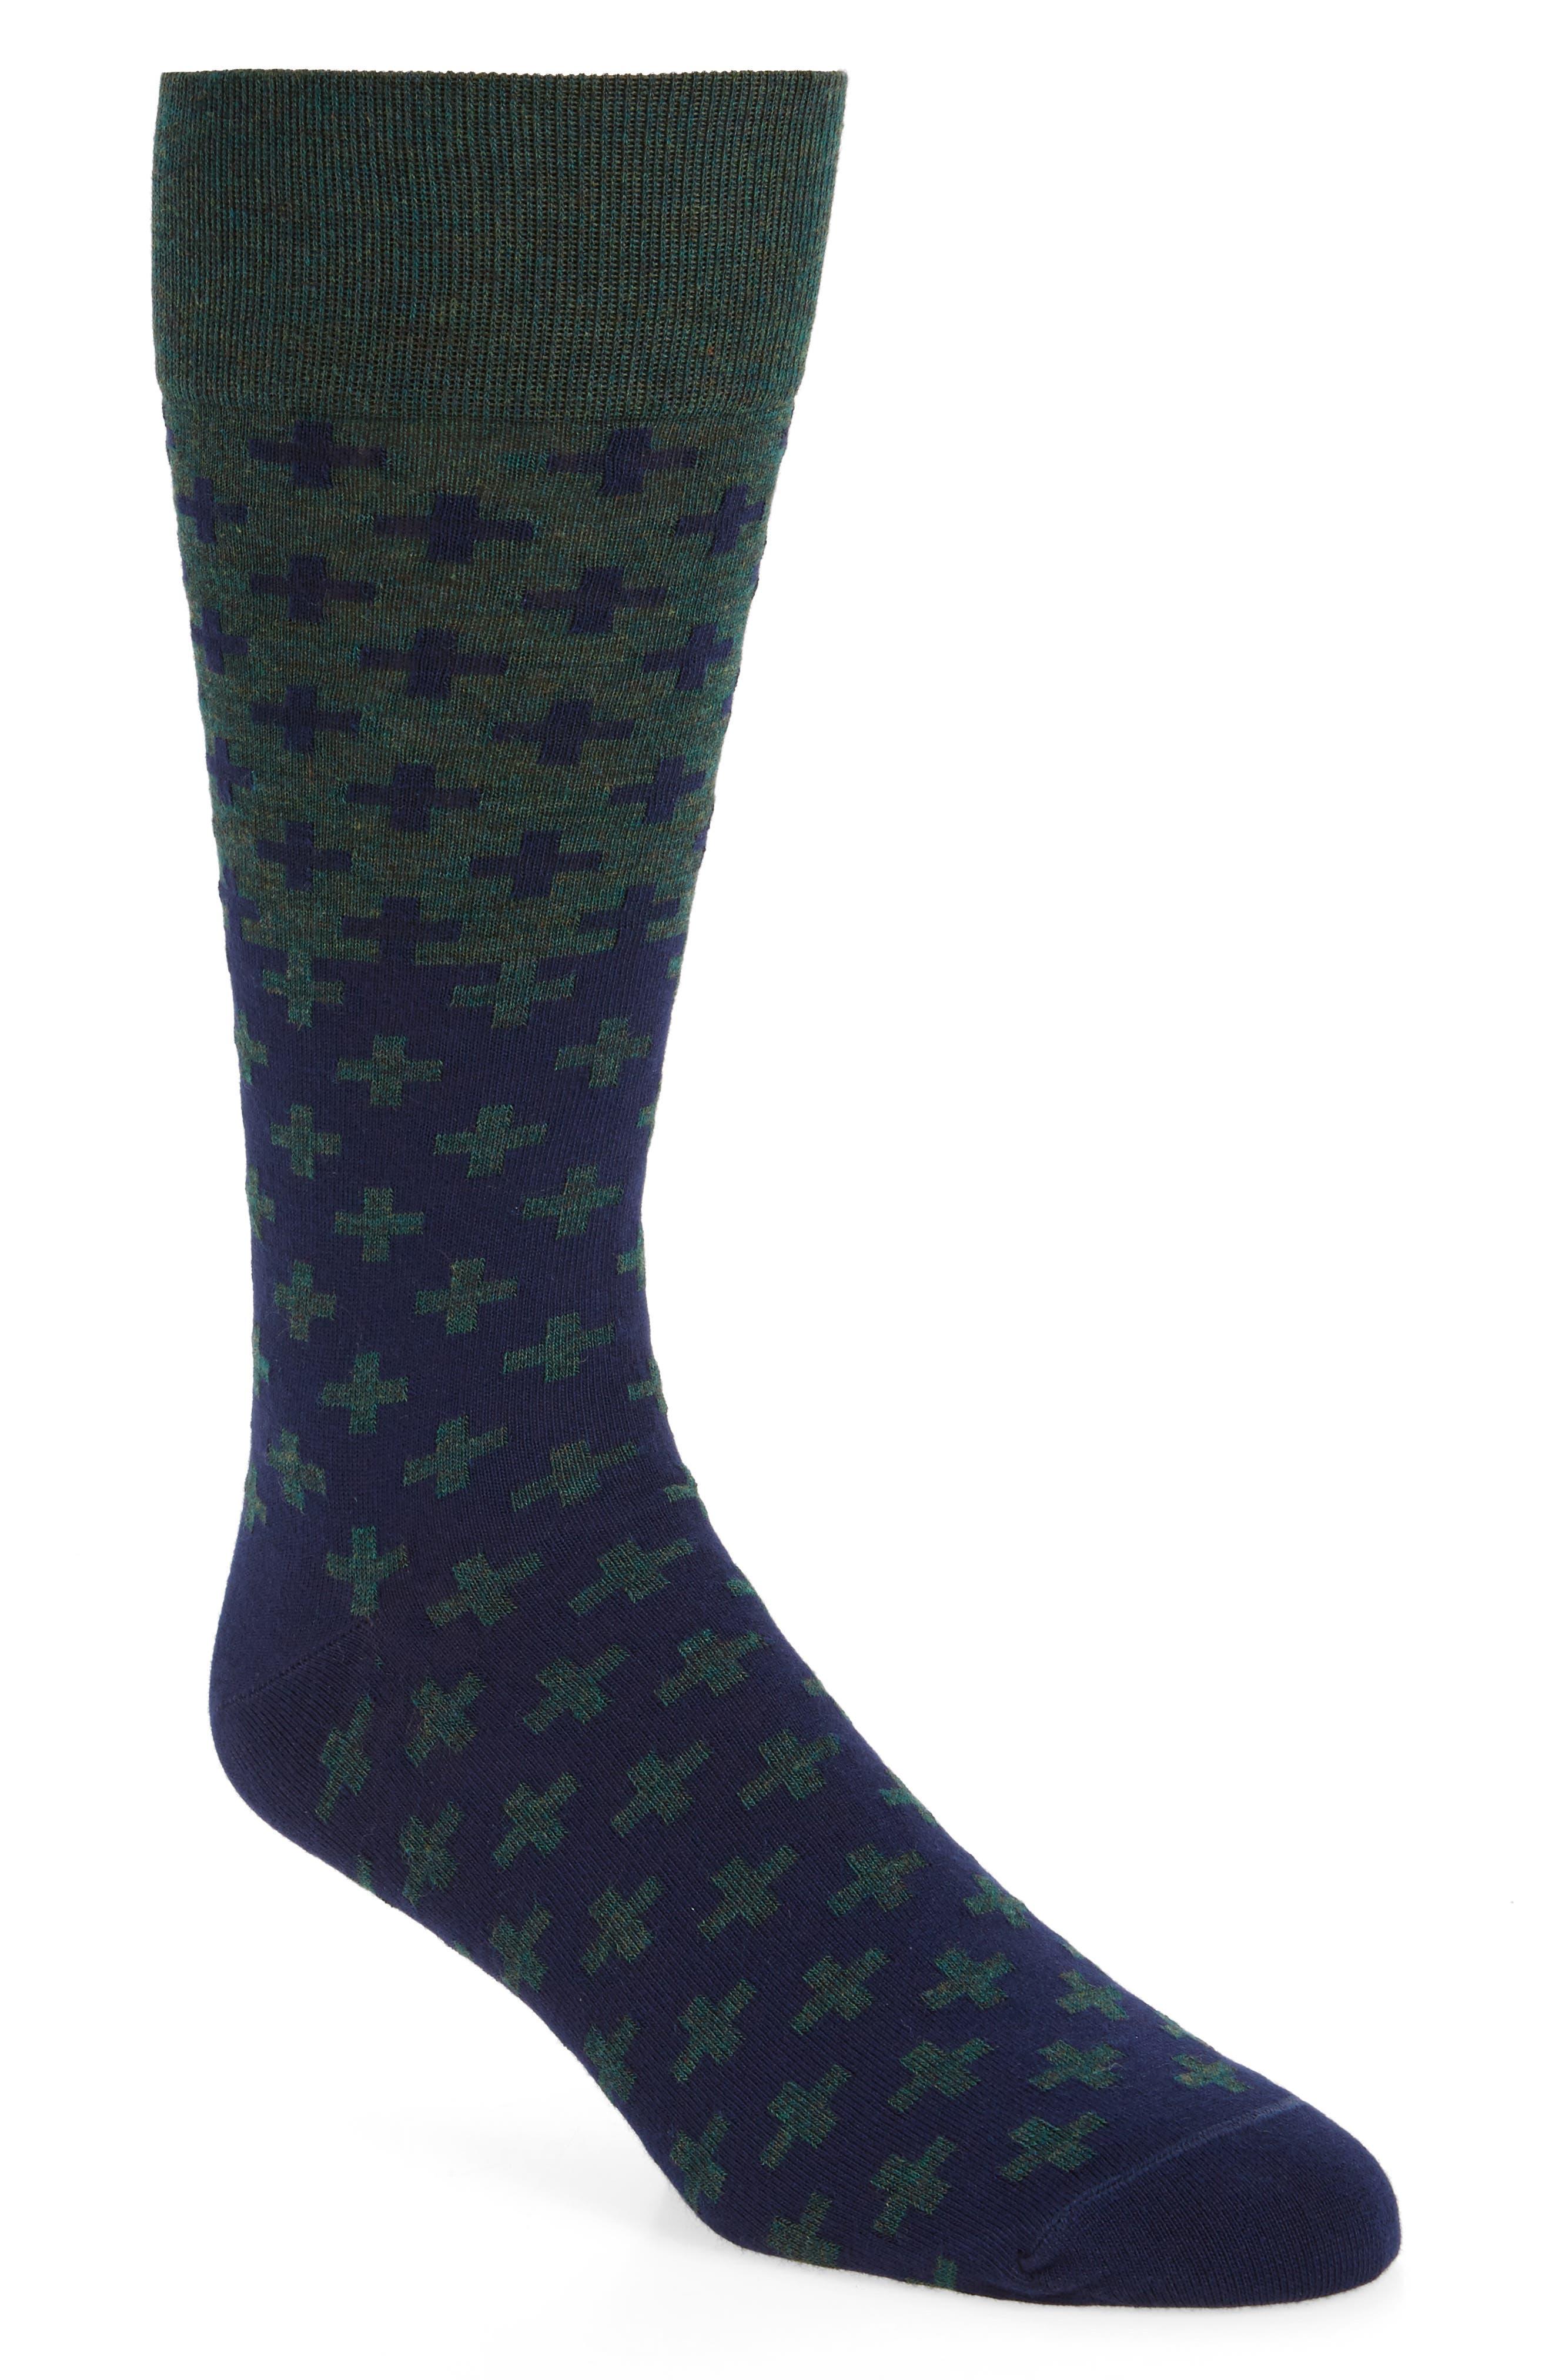 Cross Socks,                         Main,                         color, Green Sycamore